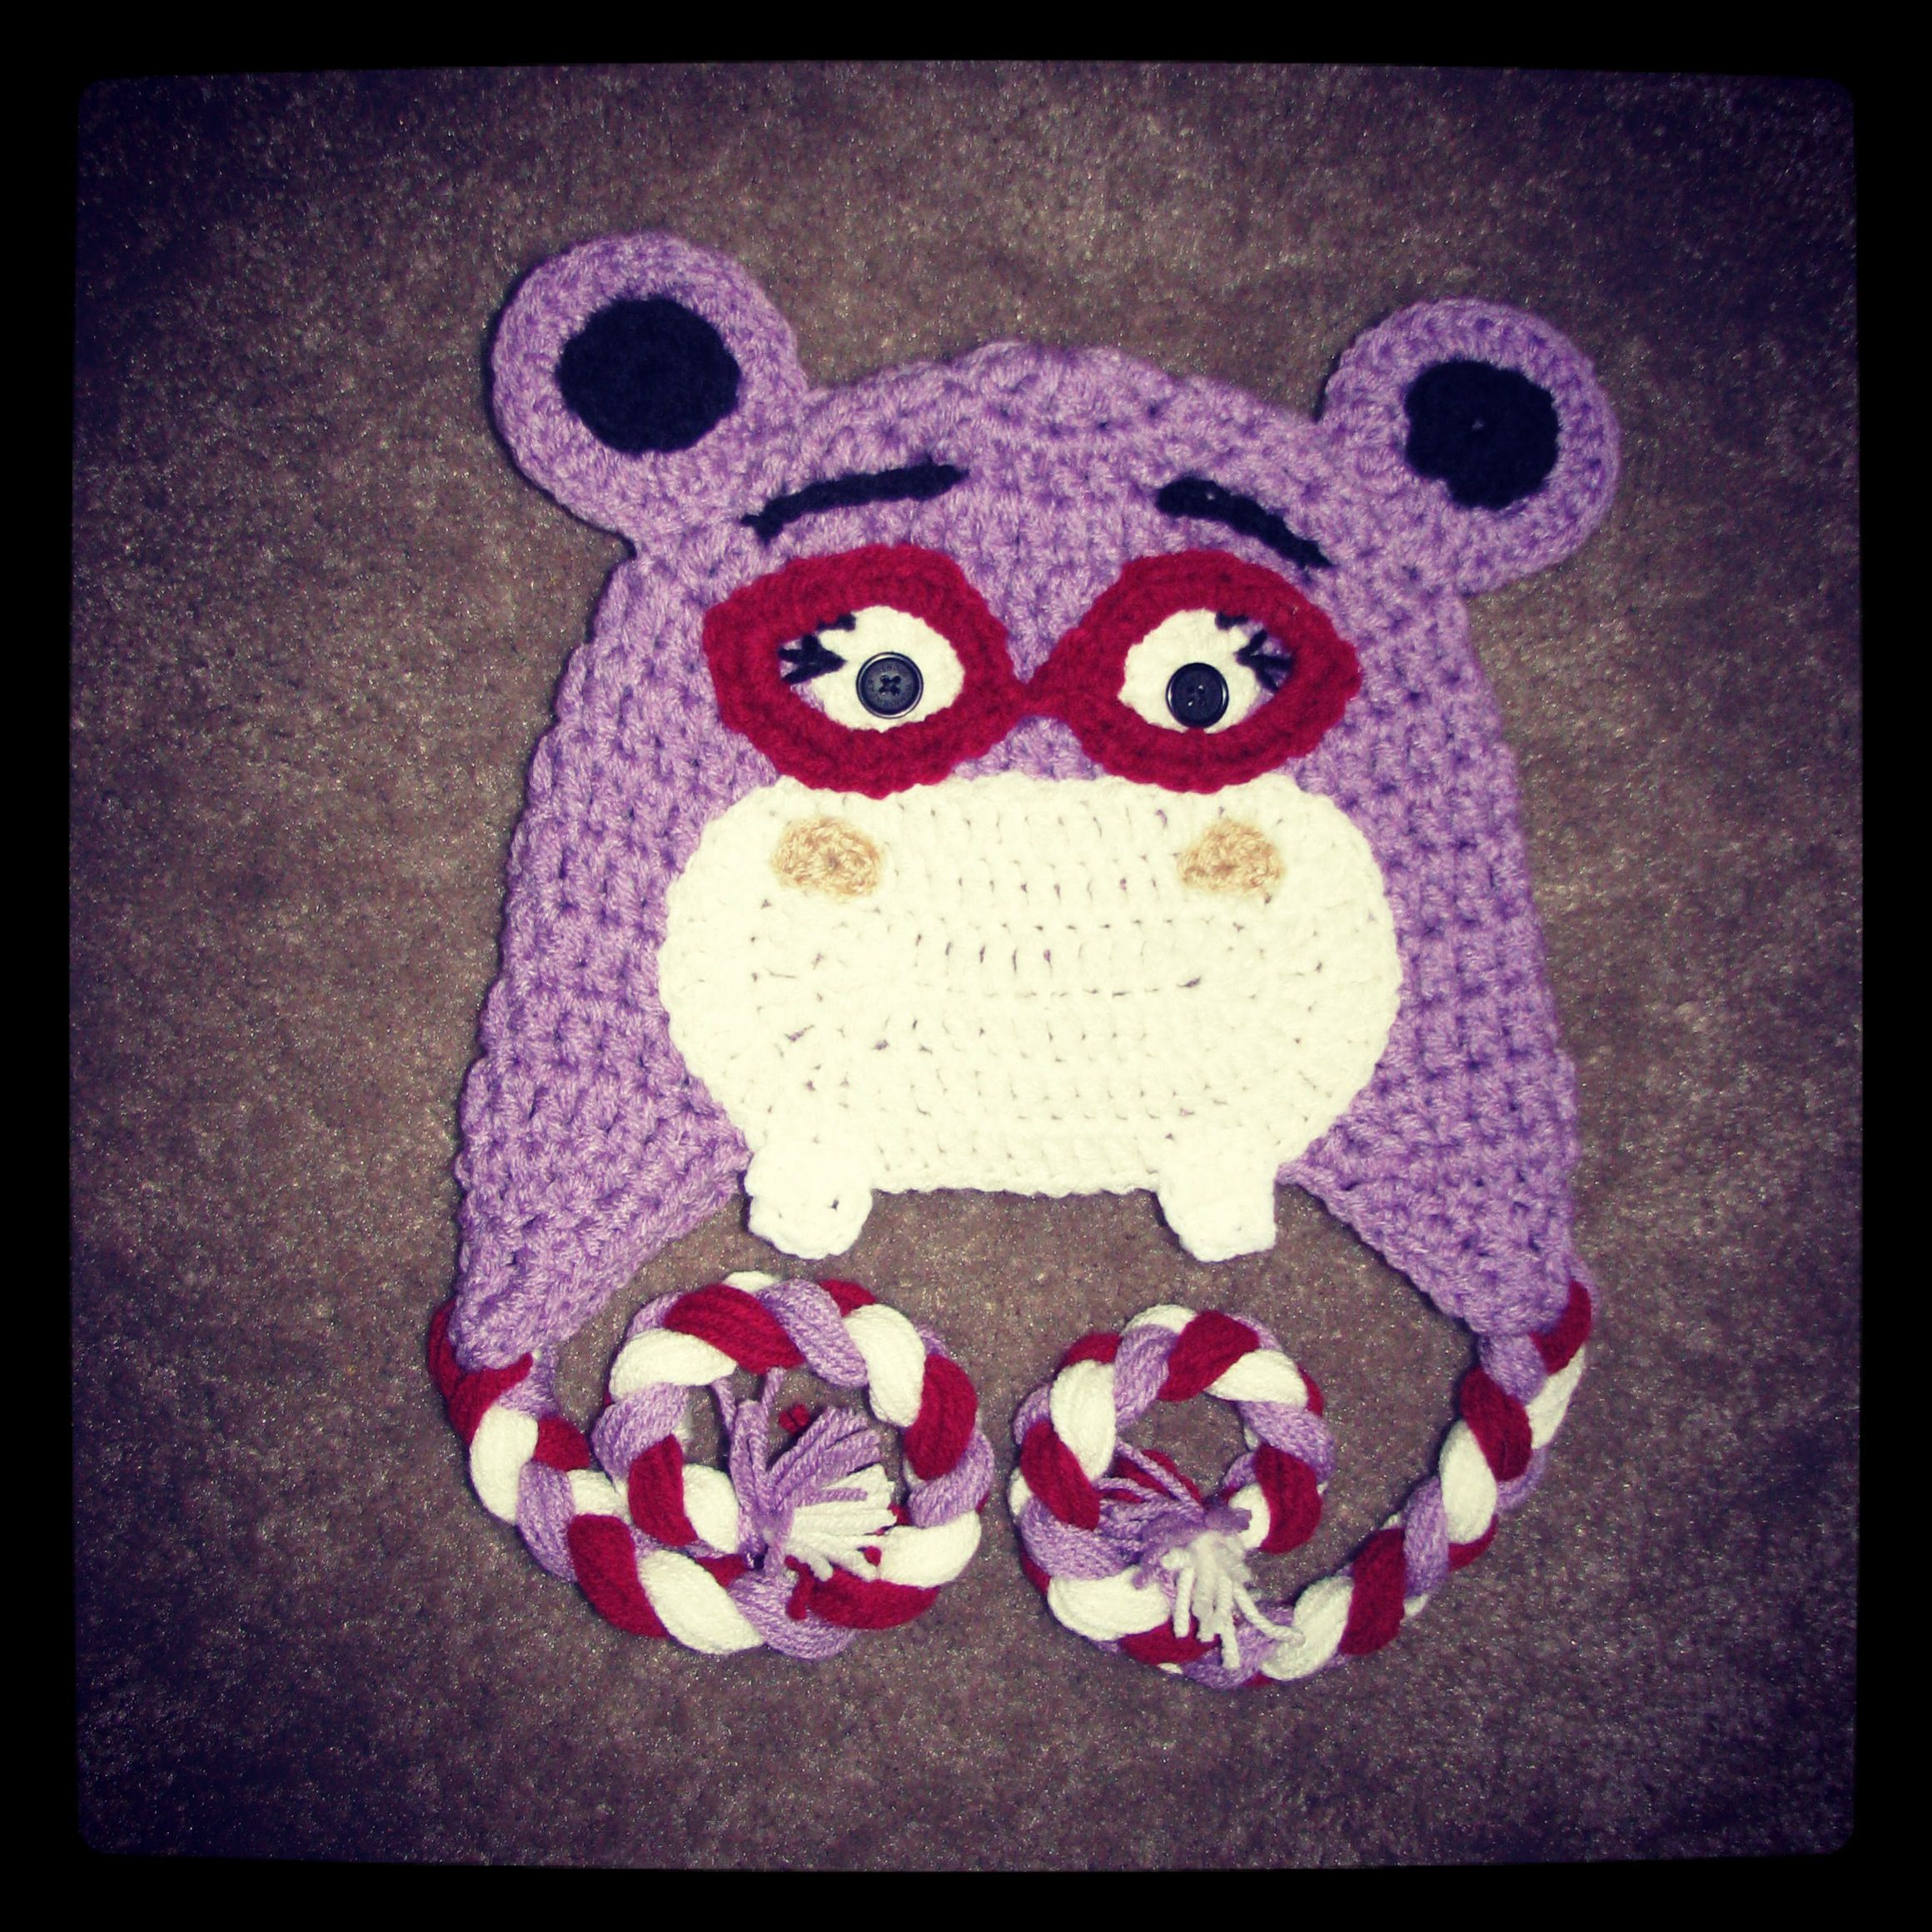 Crochet halli the hippo from Doc Mcstuffins | Crochet | Pinterest ...